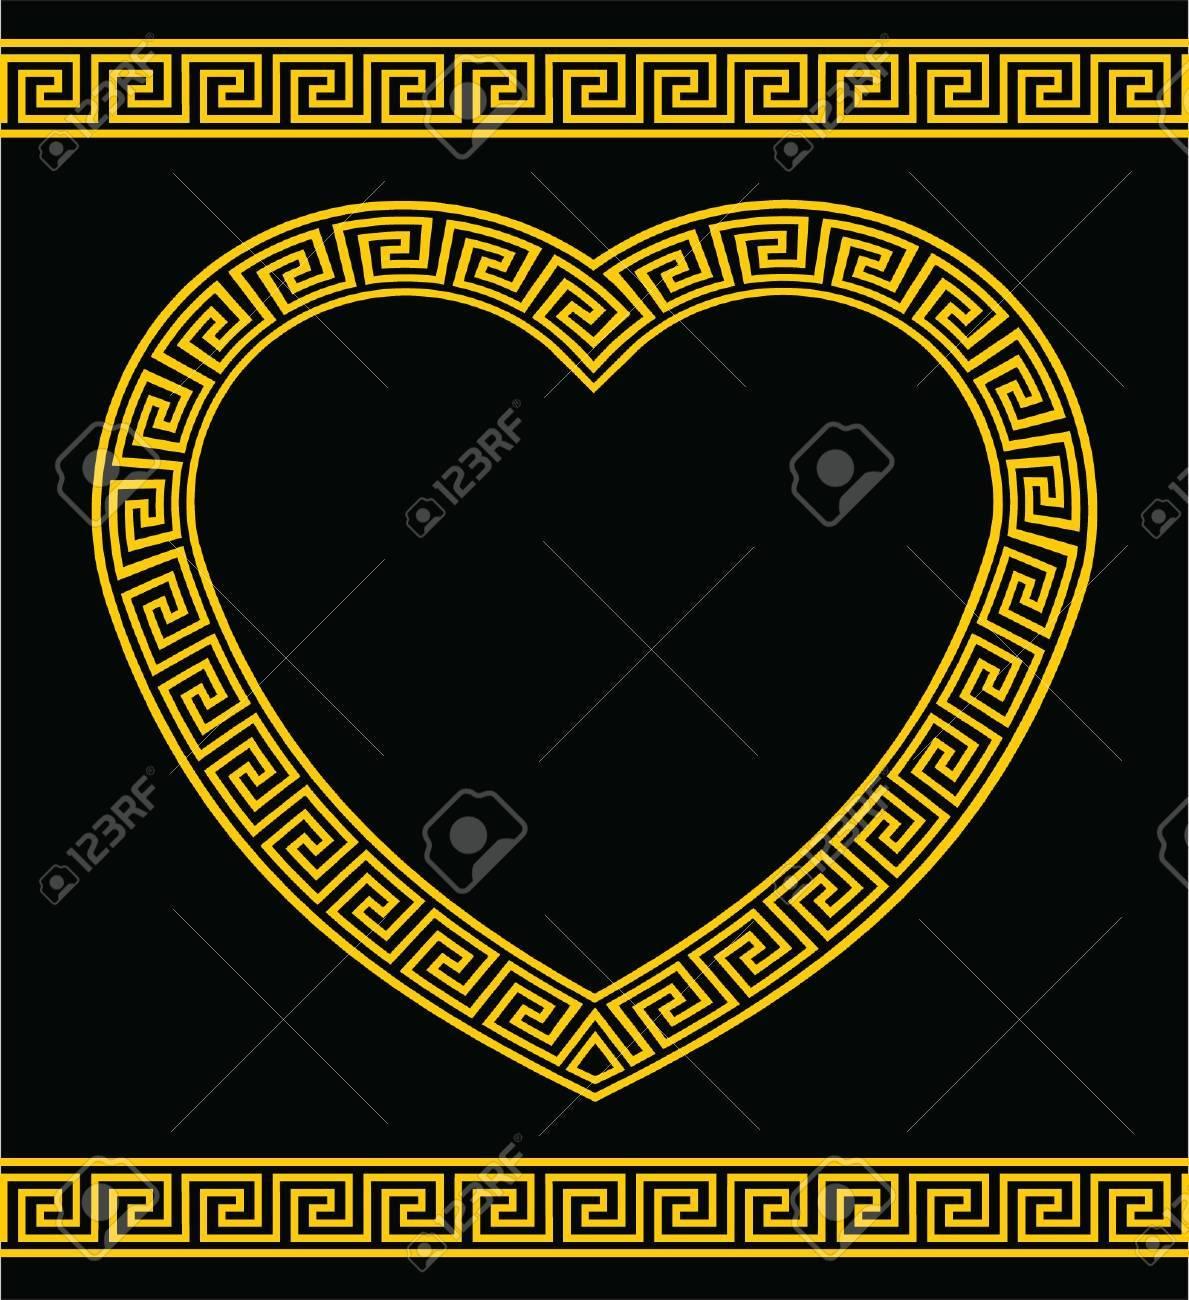 Greek Key Heart Shape Border Stock Vector - 19696877